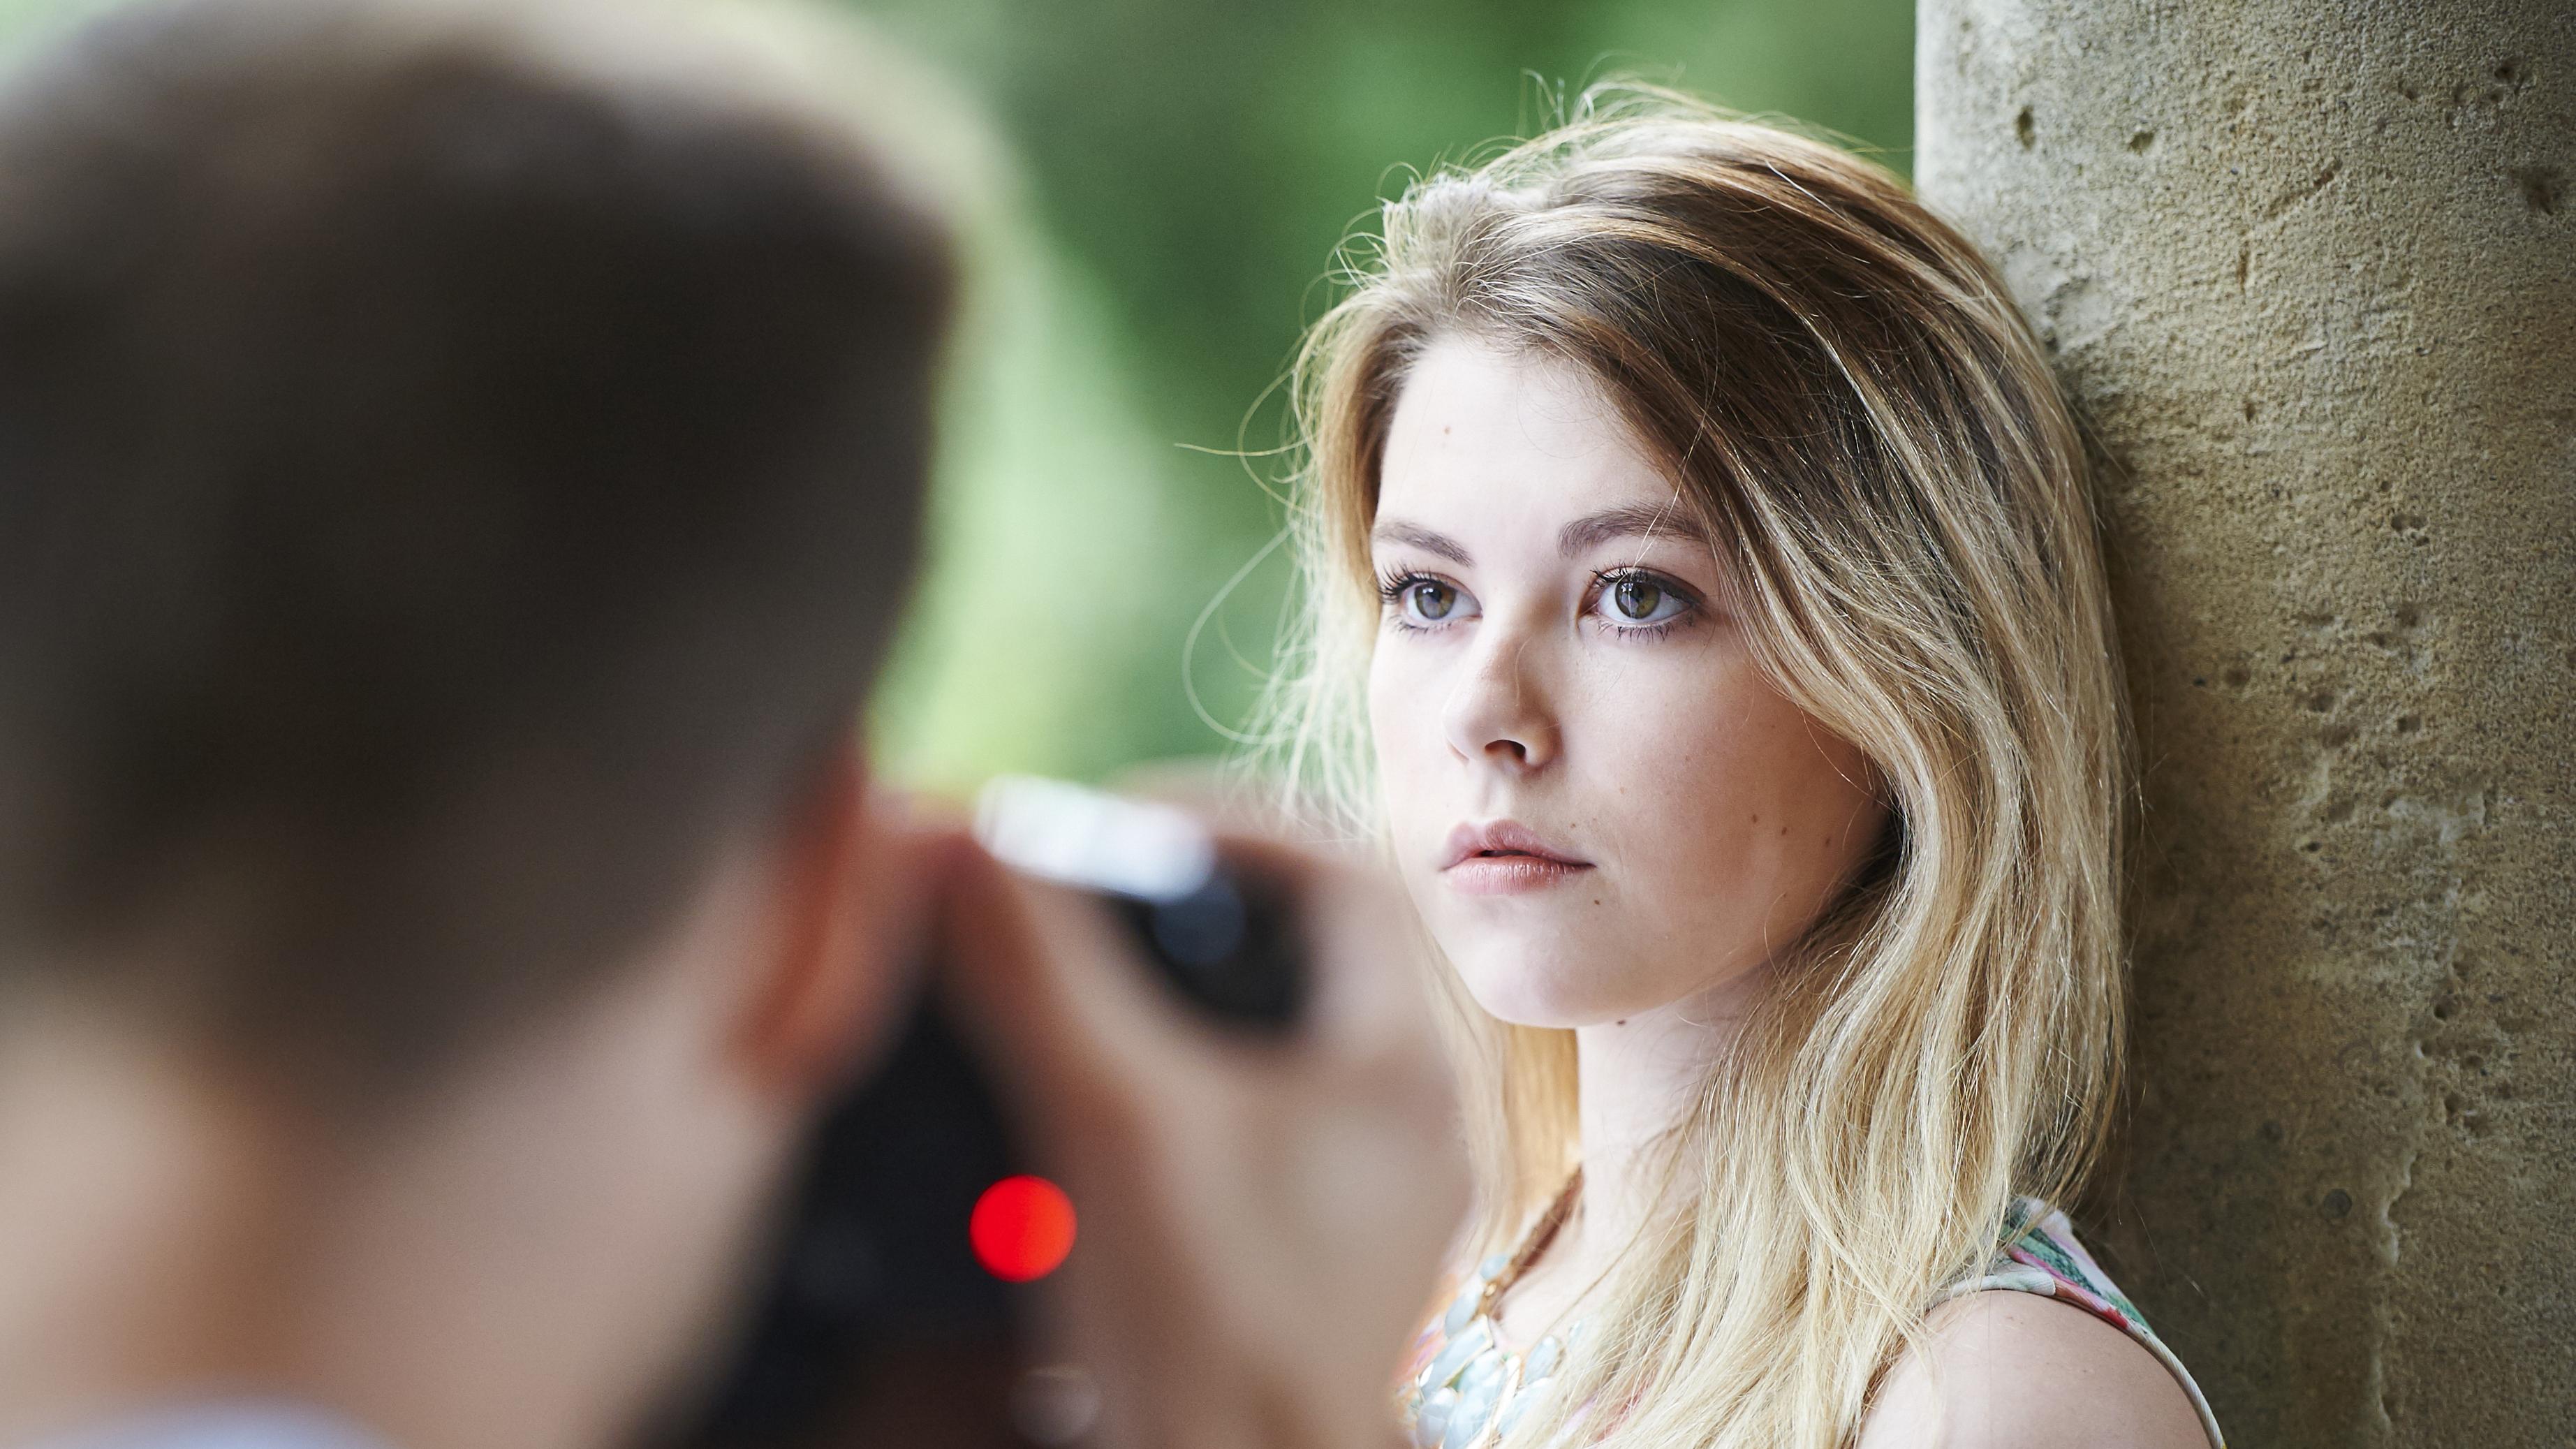 Best portrait lens 2018: fast prime lenses for Canon and Nikon DSLRs